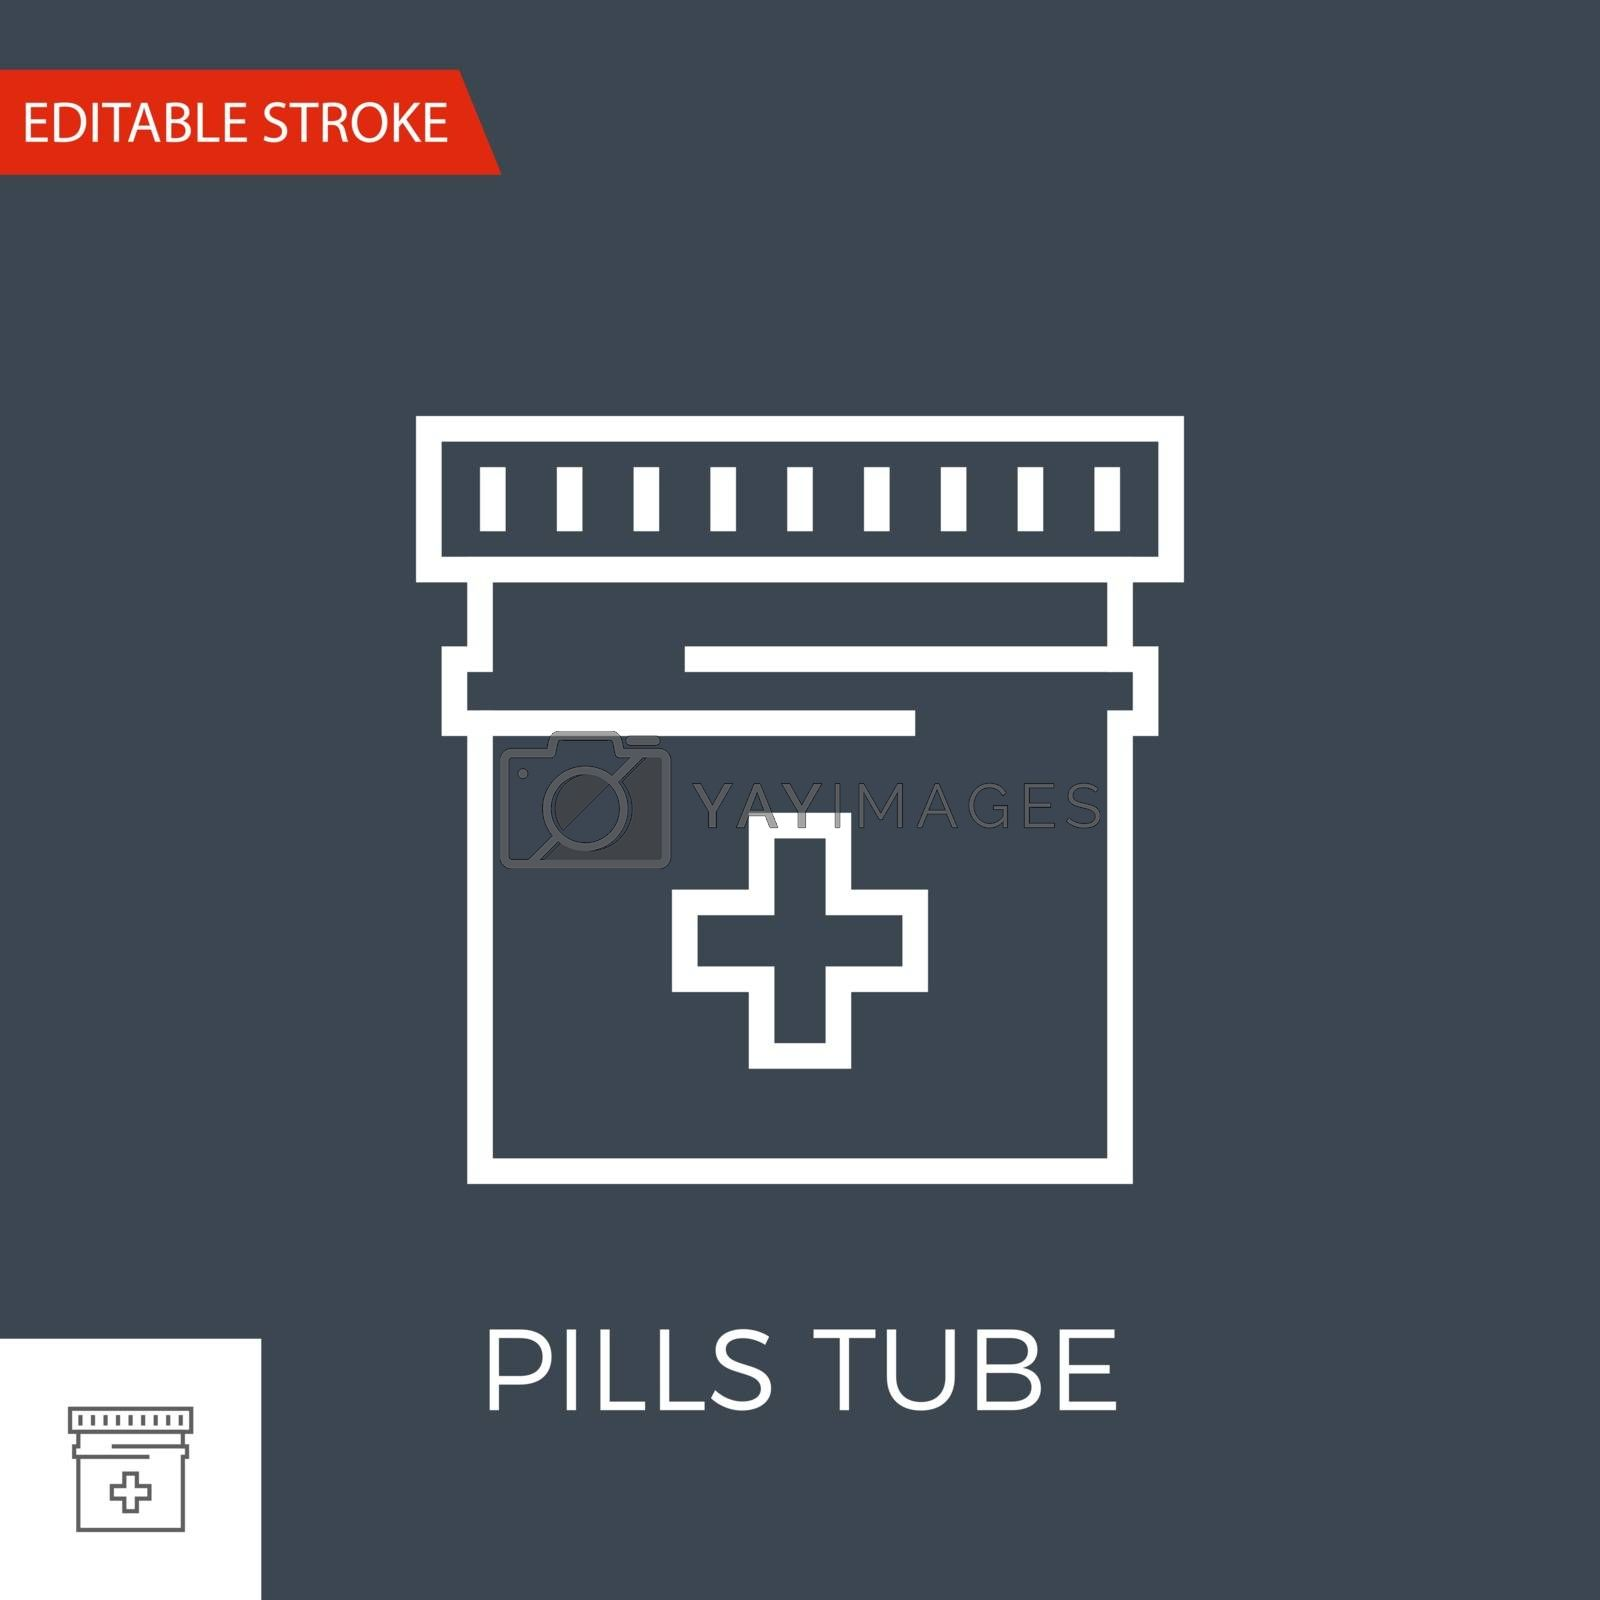 Pills Bottle Related Vector Line Icon. Drugs. Isolated on Black Background. Editable Stroke.